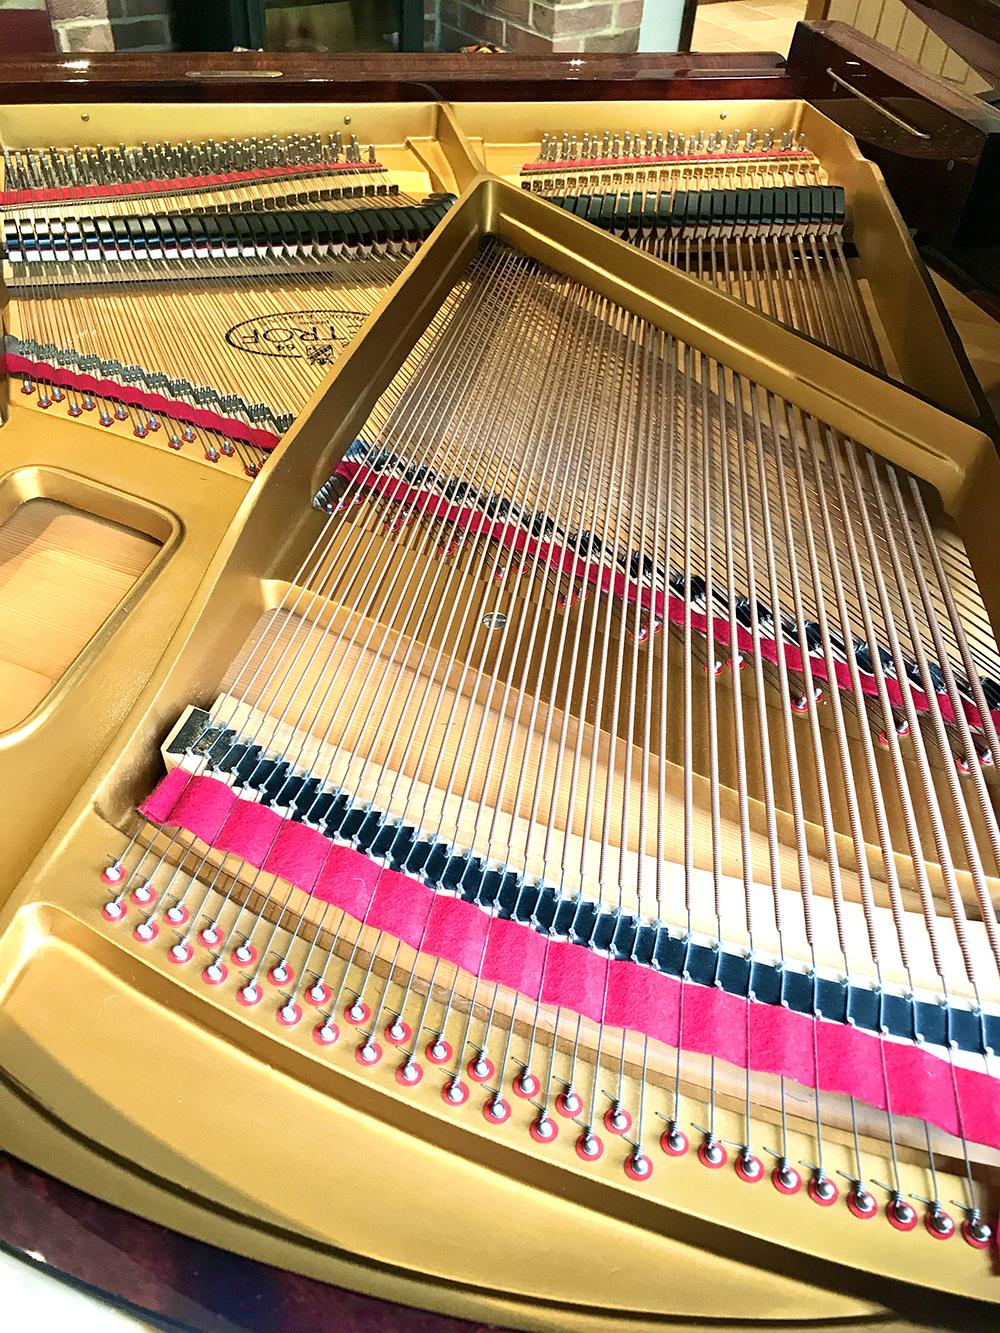 used-petrof-baby-grand-Piano-Dorset-for-sale-4.jpg